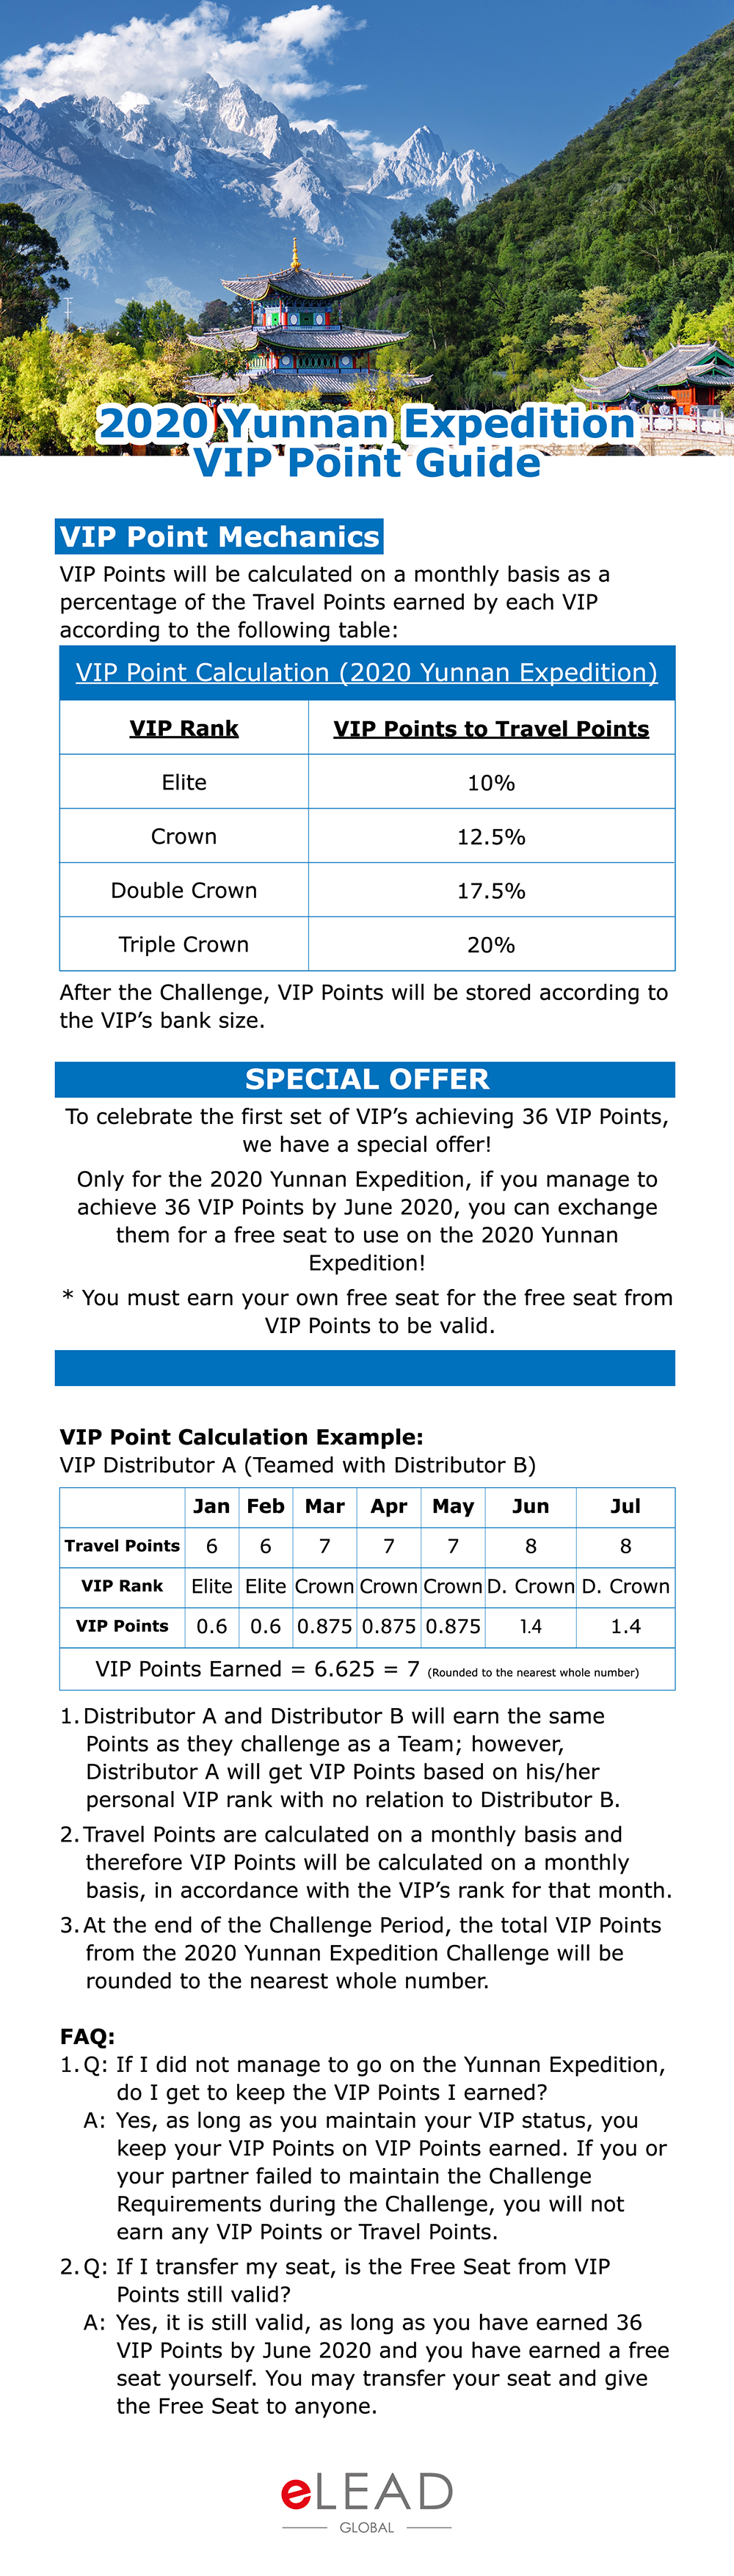 2020 Yunnan Expedition VIP Point